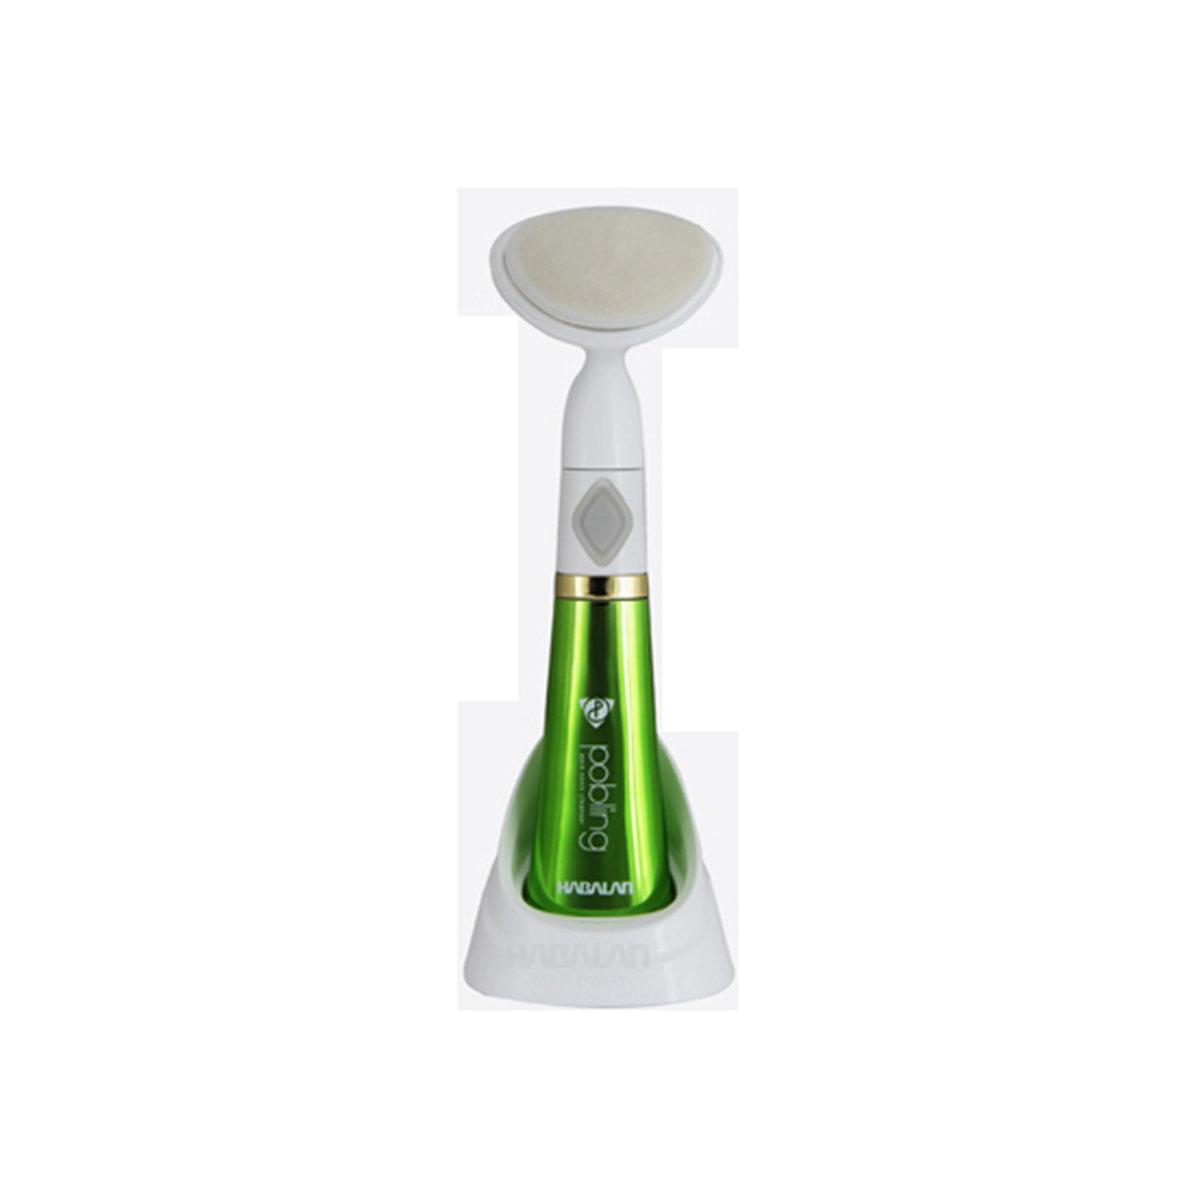 PoBling 第6代洗臉器 (Green)潔面儀刷洗臉儀機清潔洗臉神器 綠色